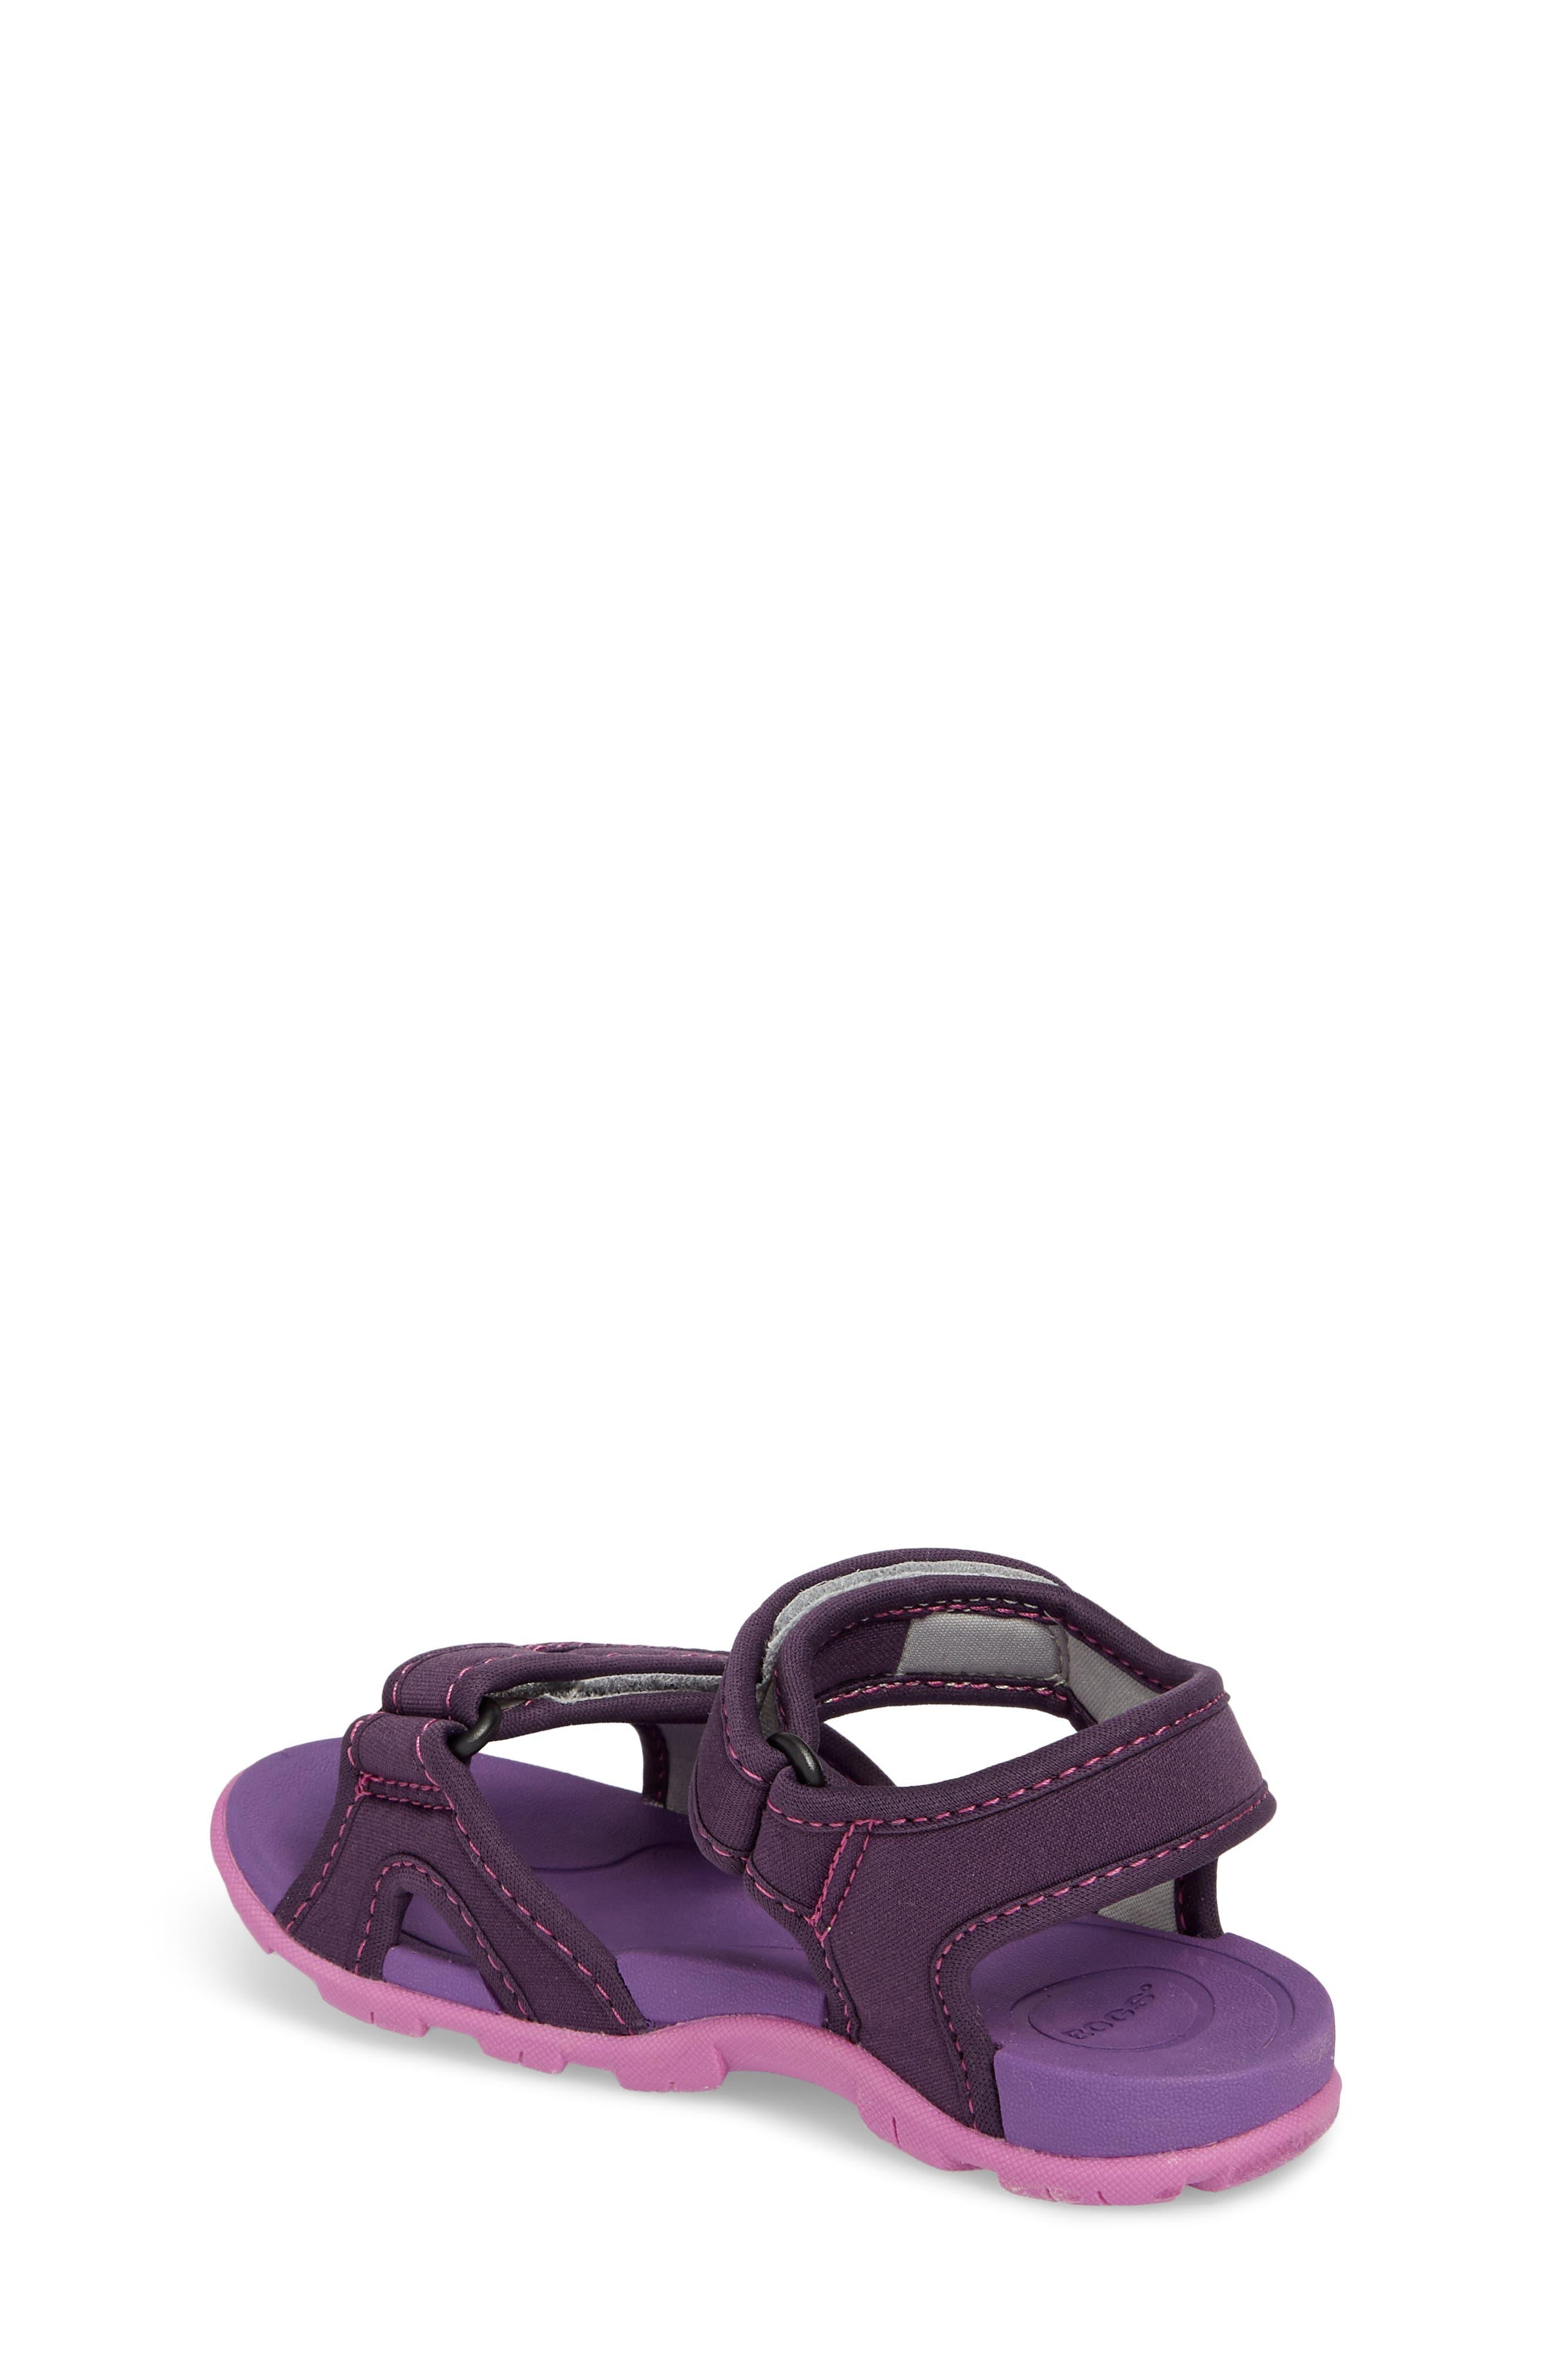 Whitefish Waterproof Sandal,                             Alternate thumbnail 2, color,                             551